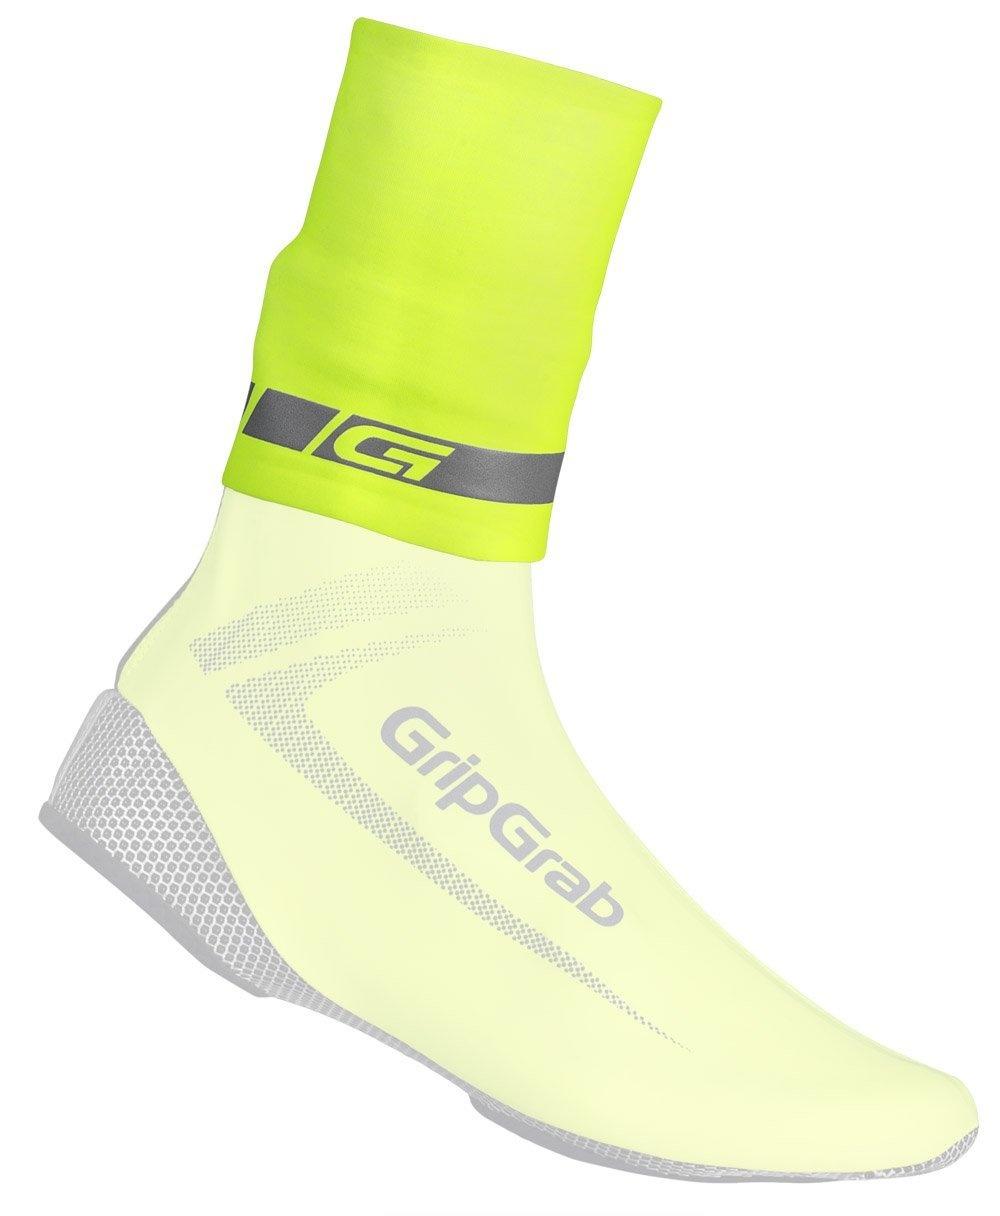 Gripgrab Cyclinggaiter Hi-Vis Ankel Forsegler